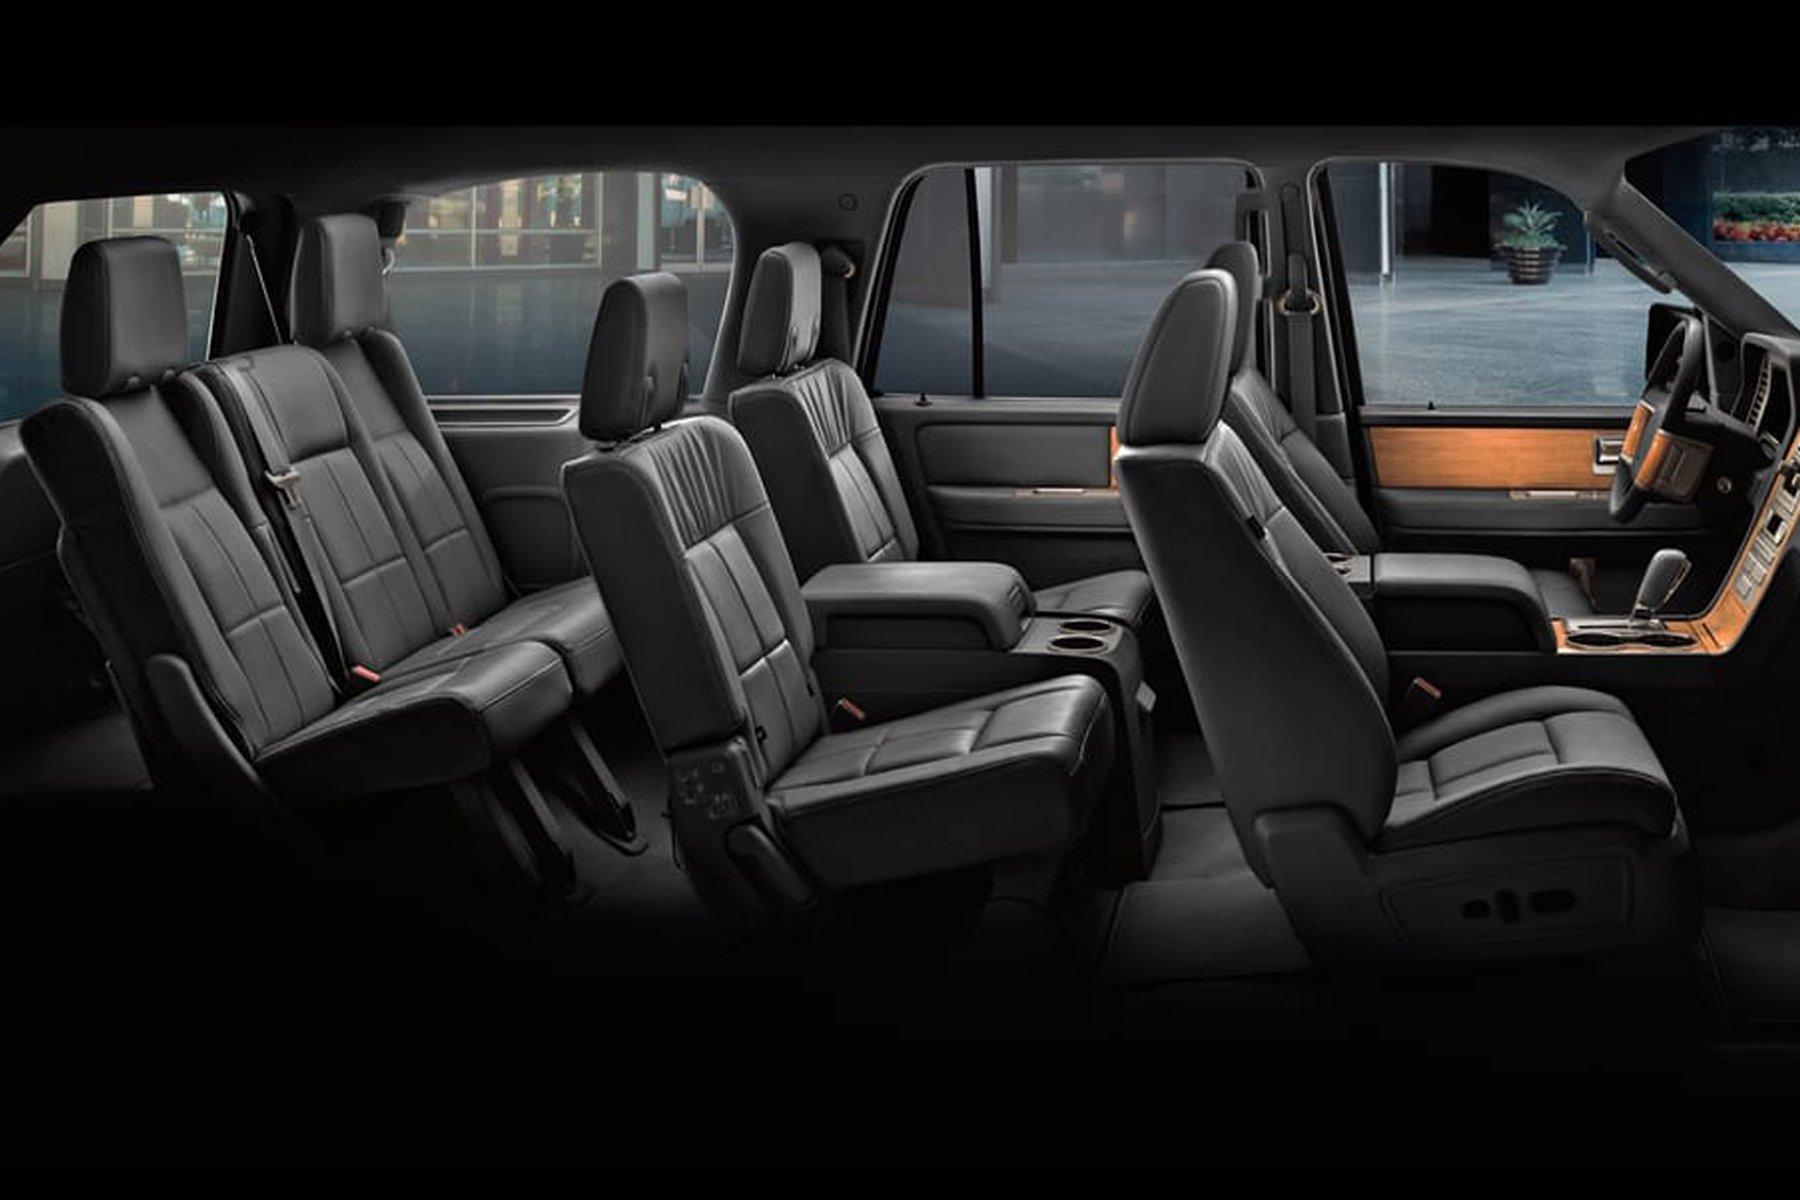 Skyline Chicago Limo Cars Luxury Fleet Black Lincoln Navigator Interior October 2020